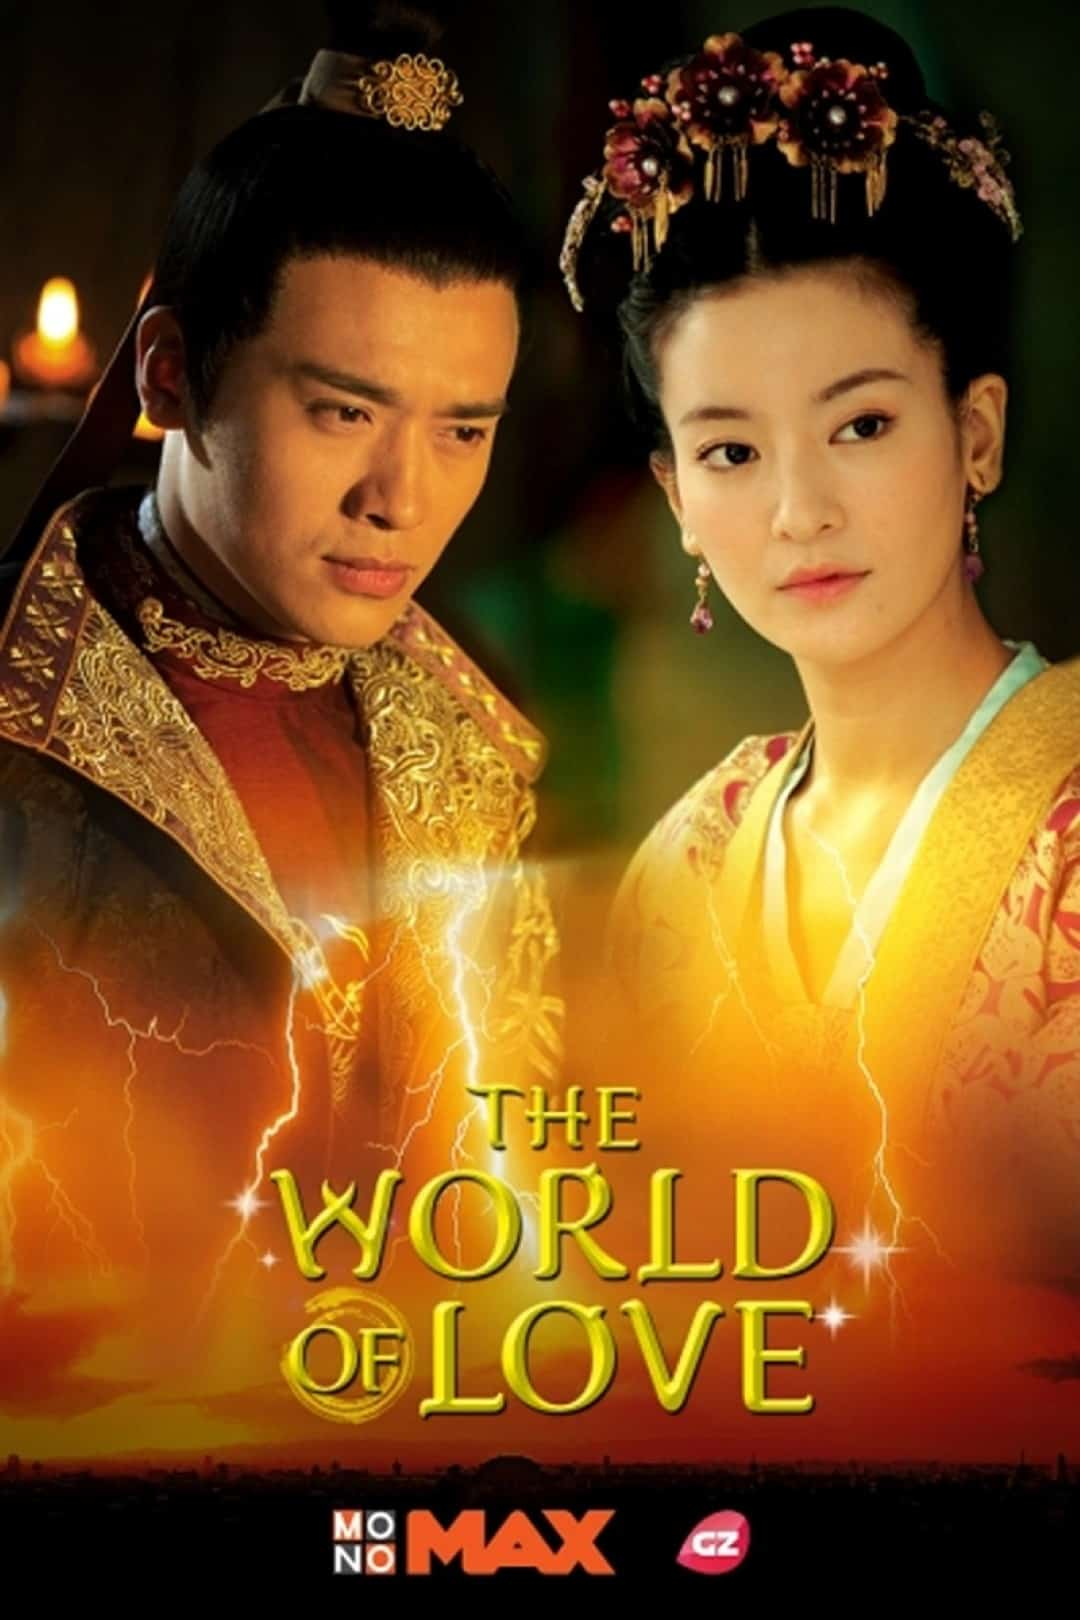 The World of Love ศึกรักโลหิตอาบบัลลังก์ พากย์ไทย EP1 – EP36 [จบ]